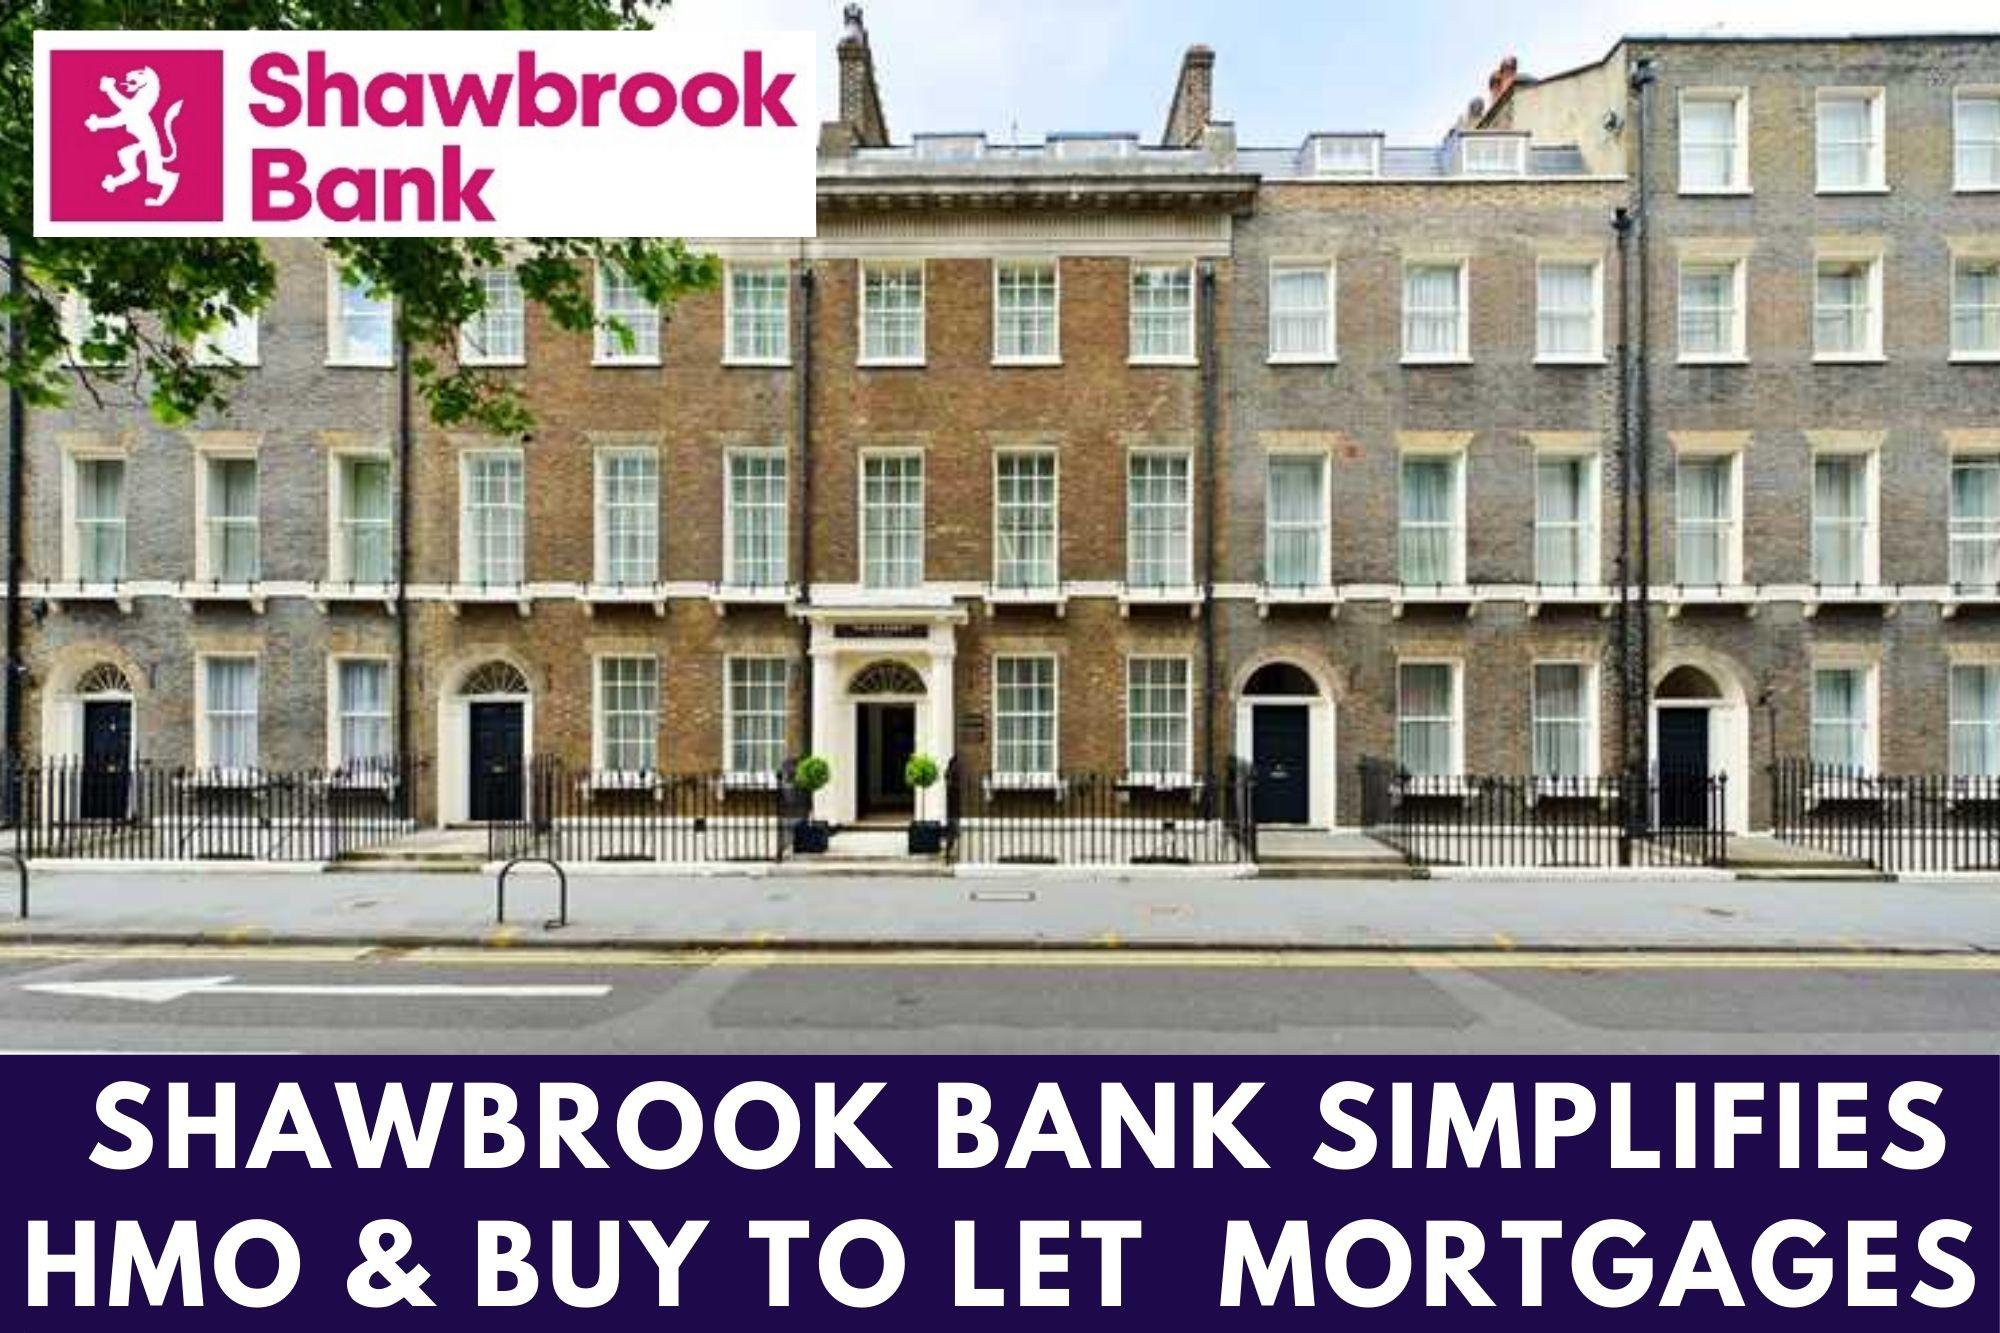 Shawbrook Bank Simplifies HMO & BTL Mortgages